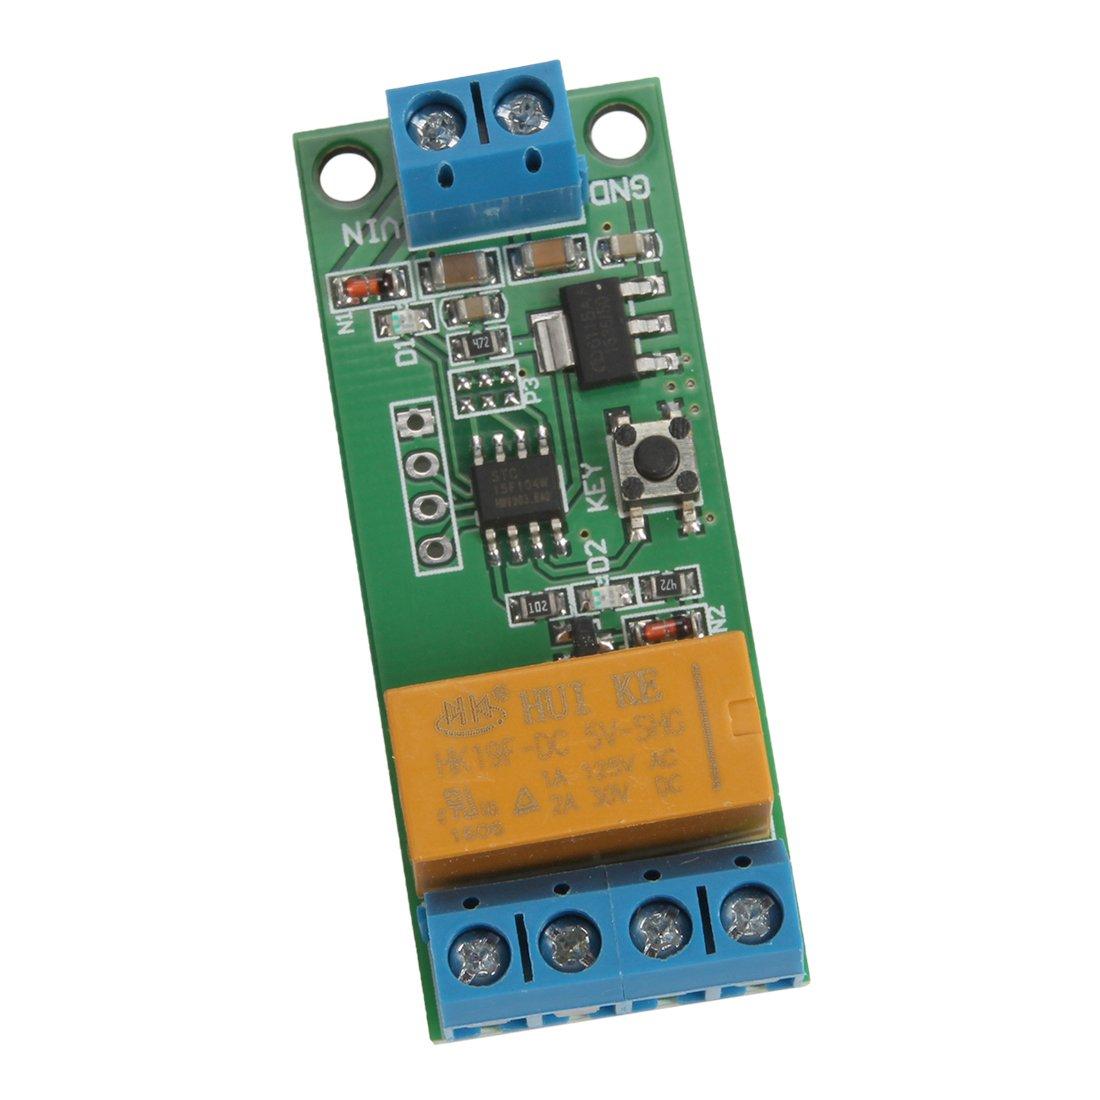 Vanki 5v 6v 9v Dc Motor Reverse Polarity Cyclic Timer Switch Time Automatic By Relay Repeater Delay 1pcs